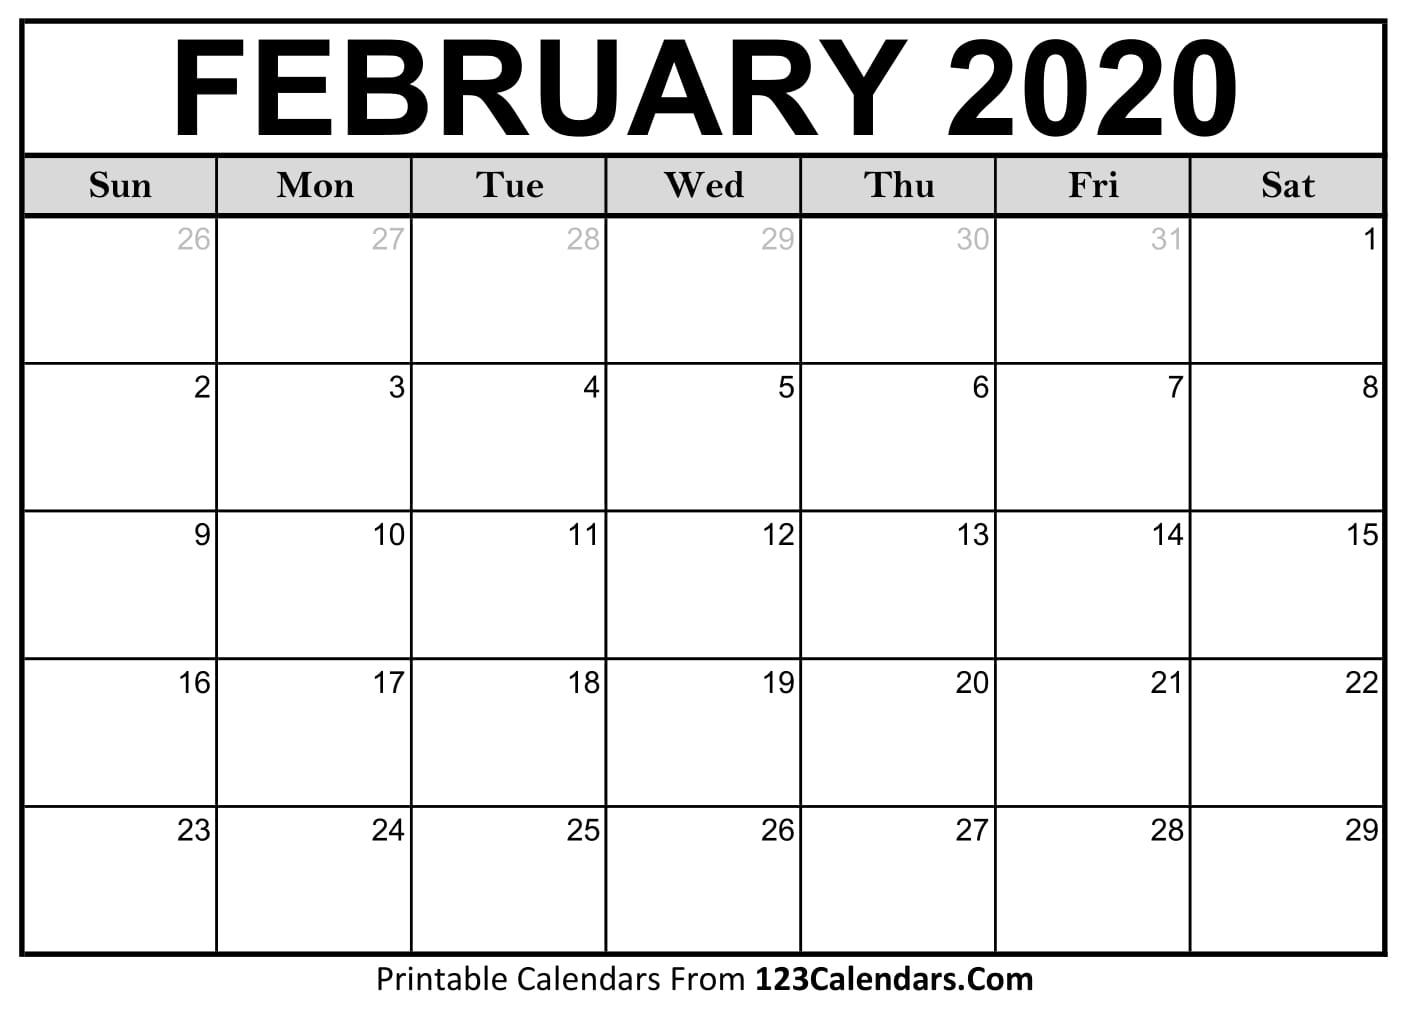 February 2020 Printable Calendar   123Calendars